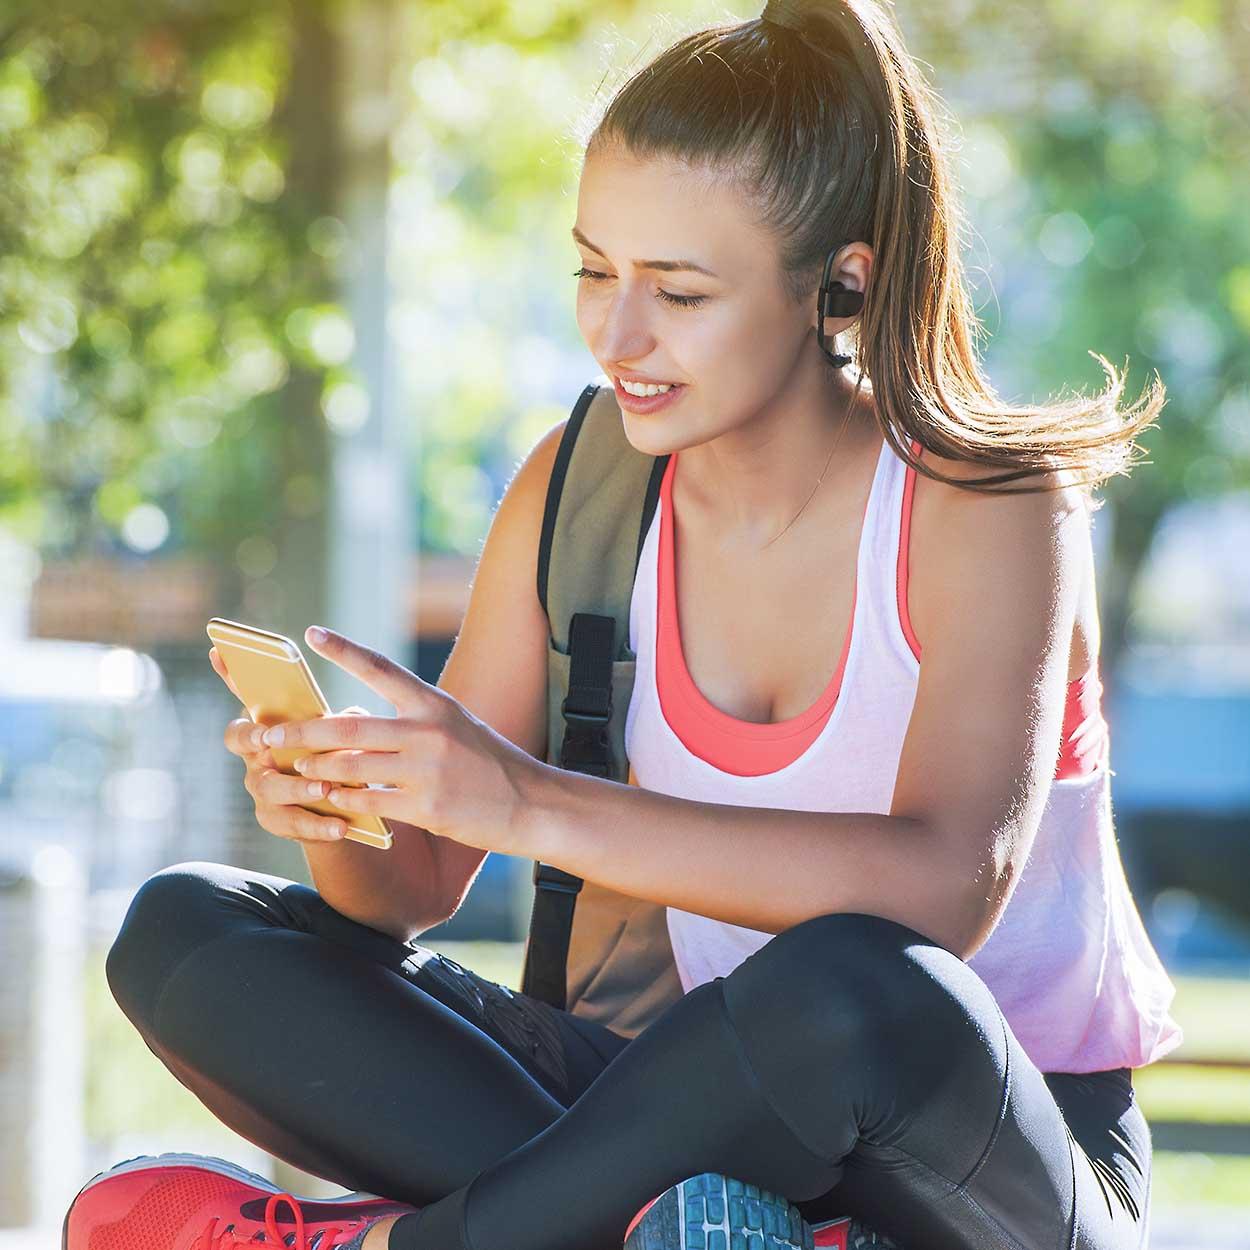 Native Mobile App Member Communications